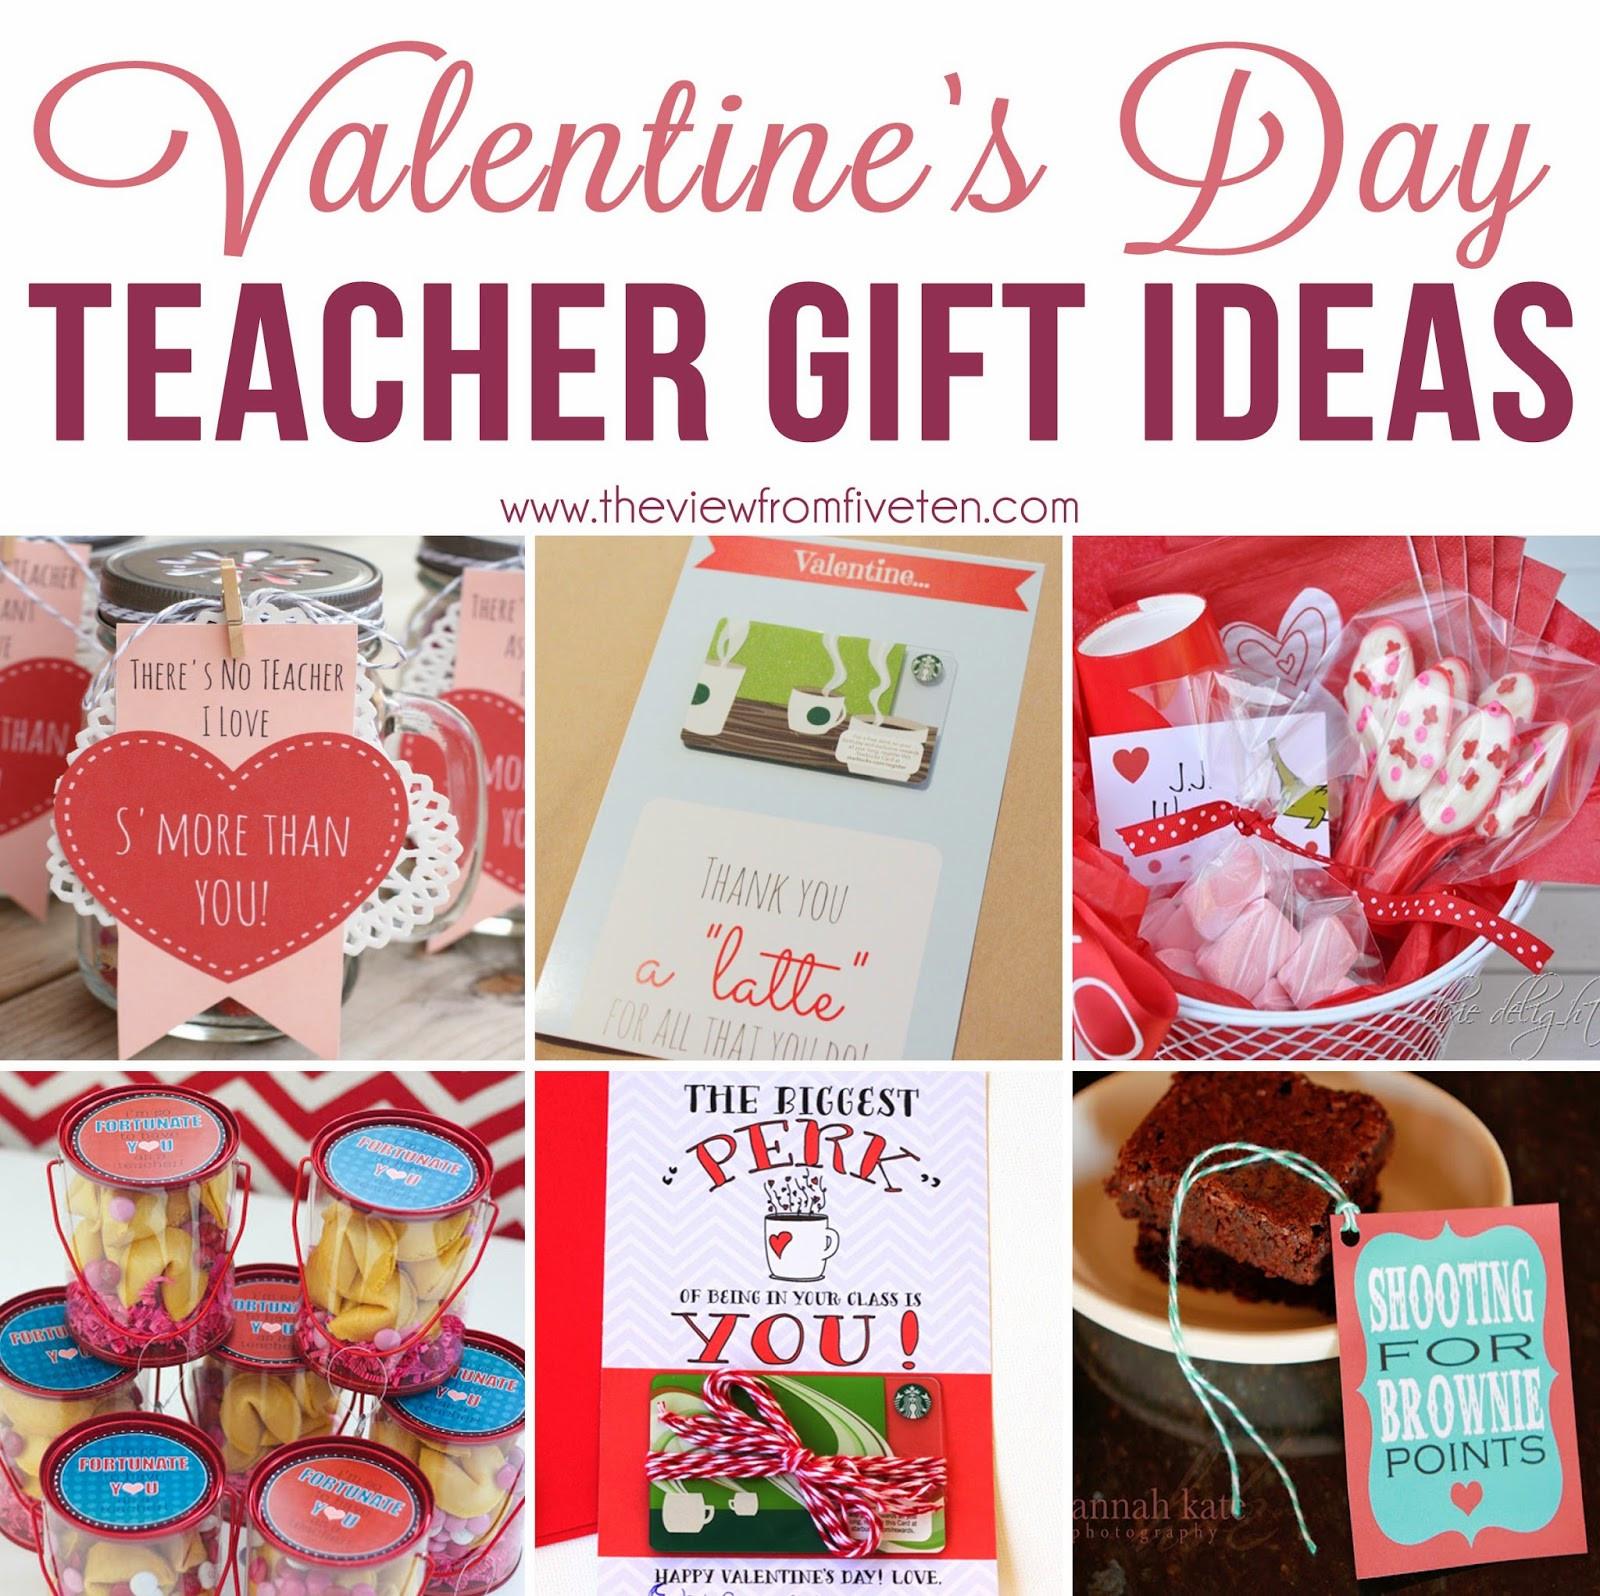 Valentines Gift Ideas For Teachers  Best Valentine s Day Gifts Ideas for Teachers 2019 A Bud